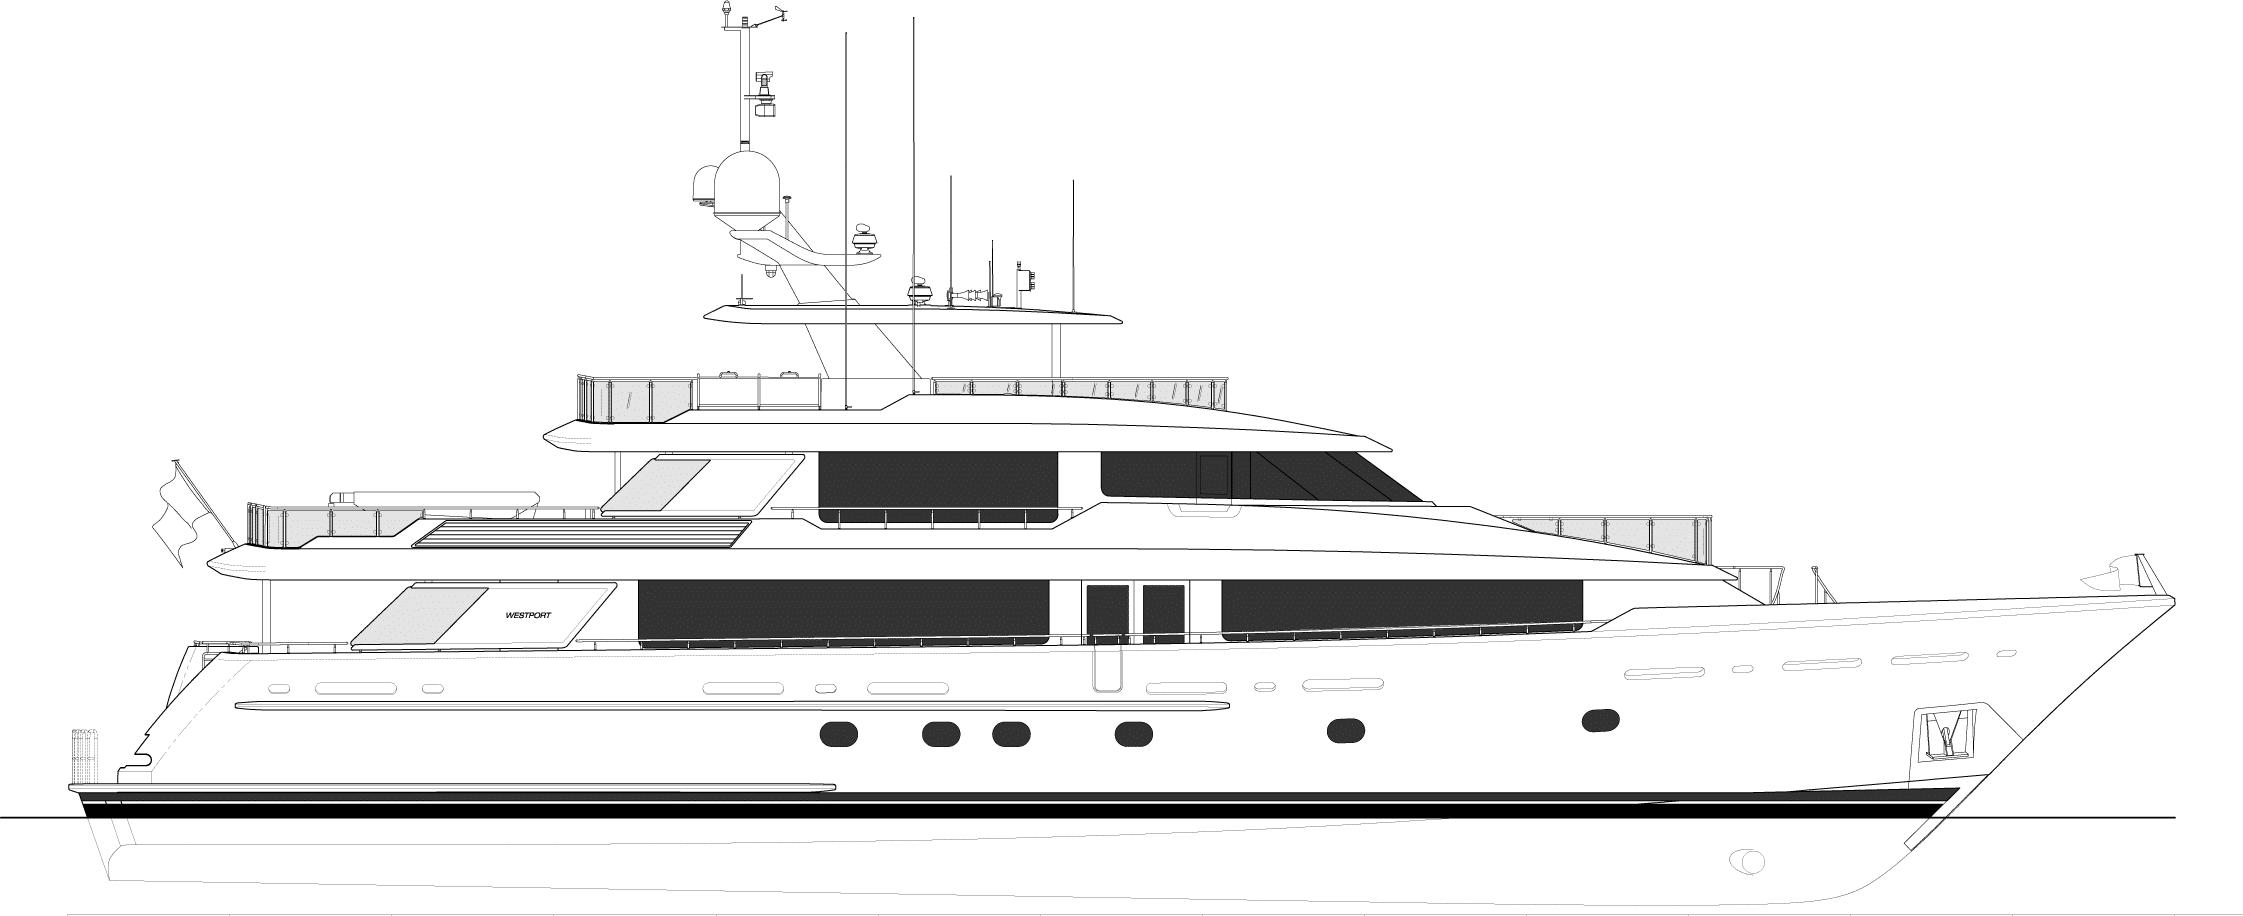 Westport W130 - 40m   Profile